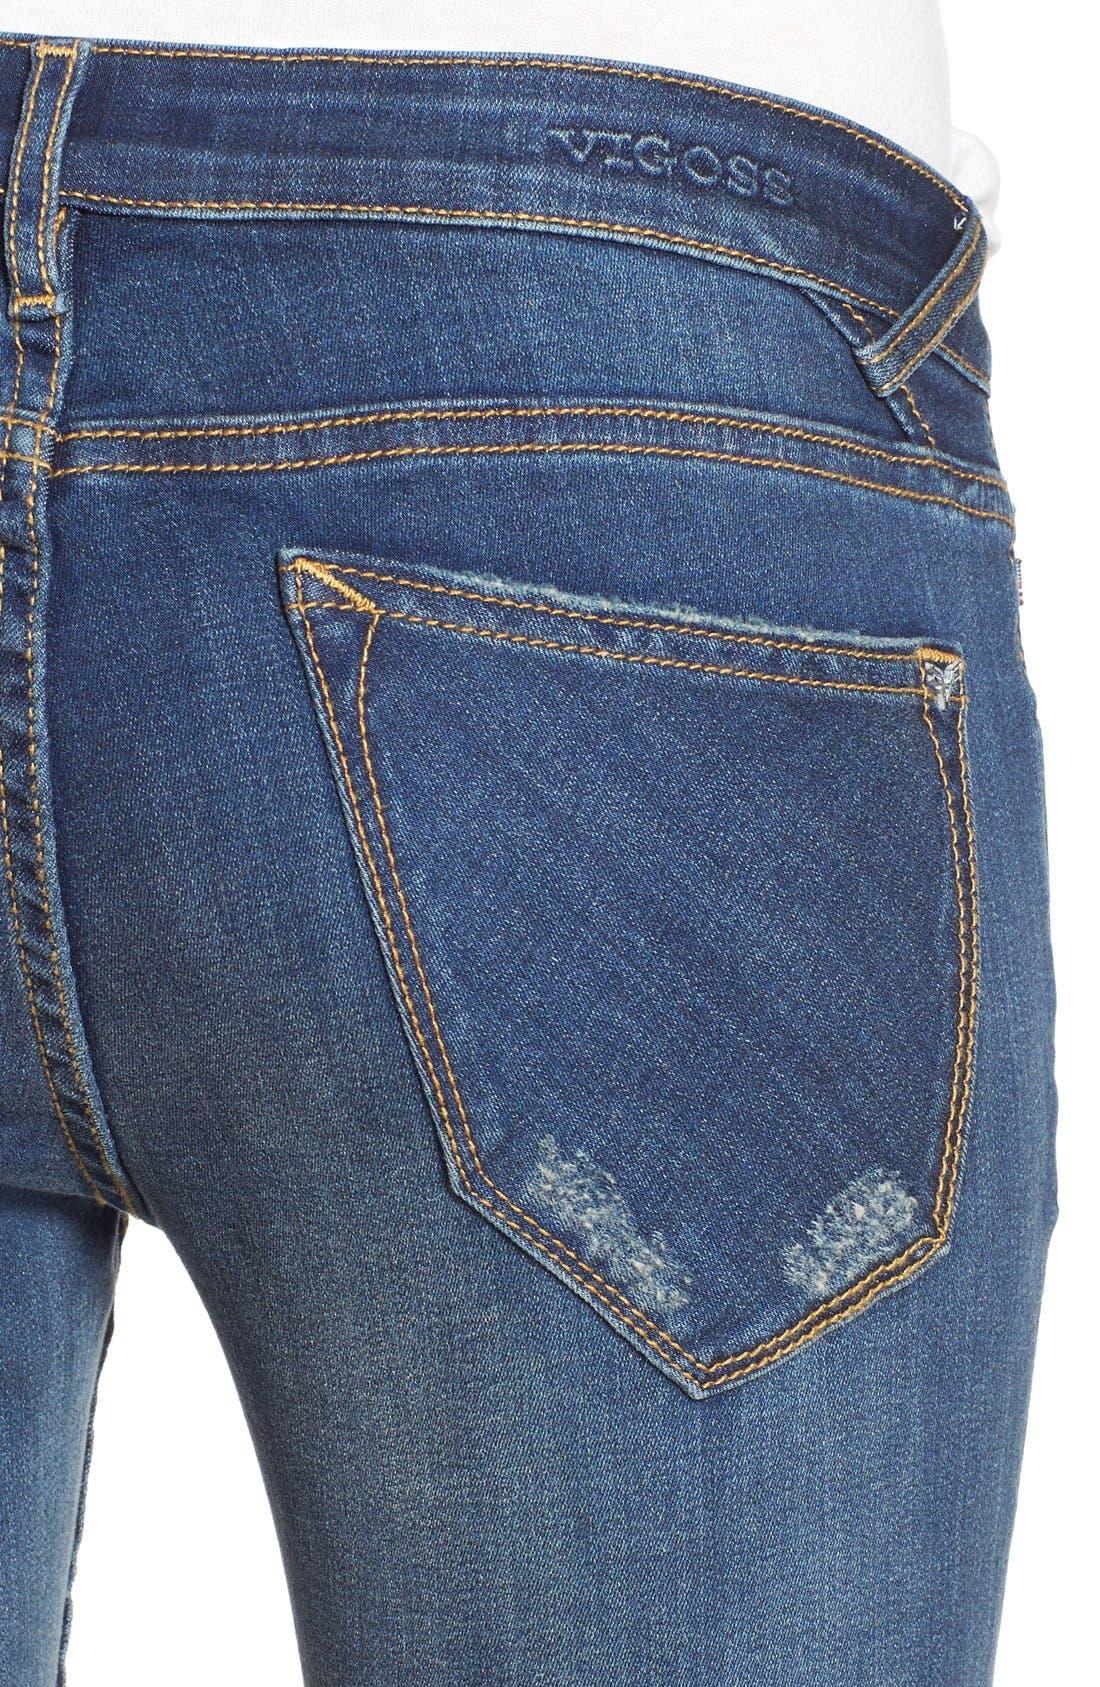 Alternate Image 4  - Vigoss 'Thompson' Distressed Skinny Jeans (Neptune)